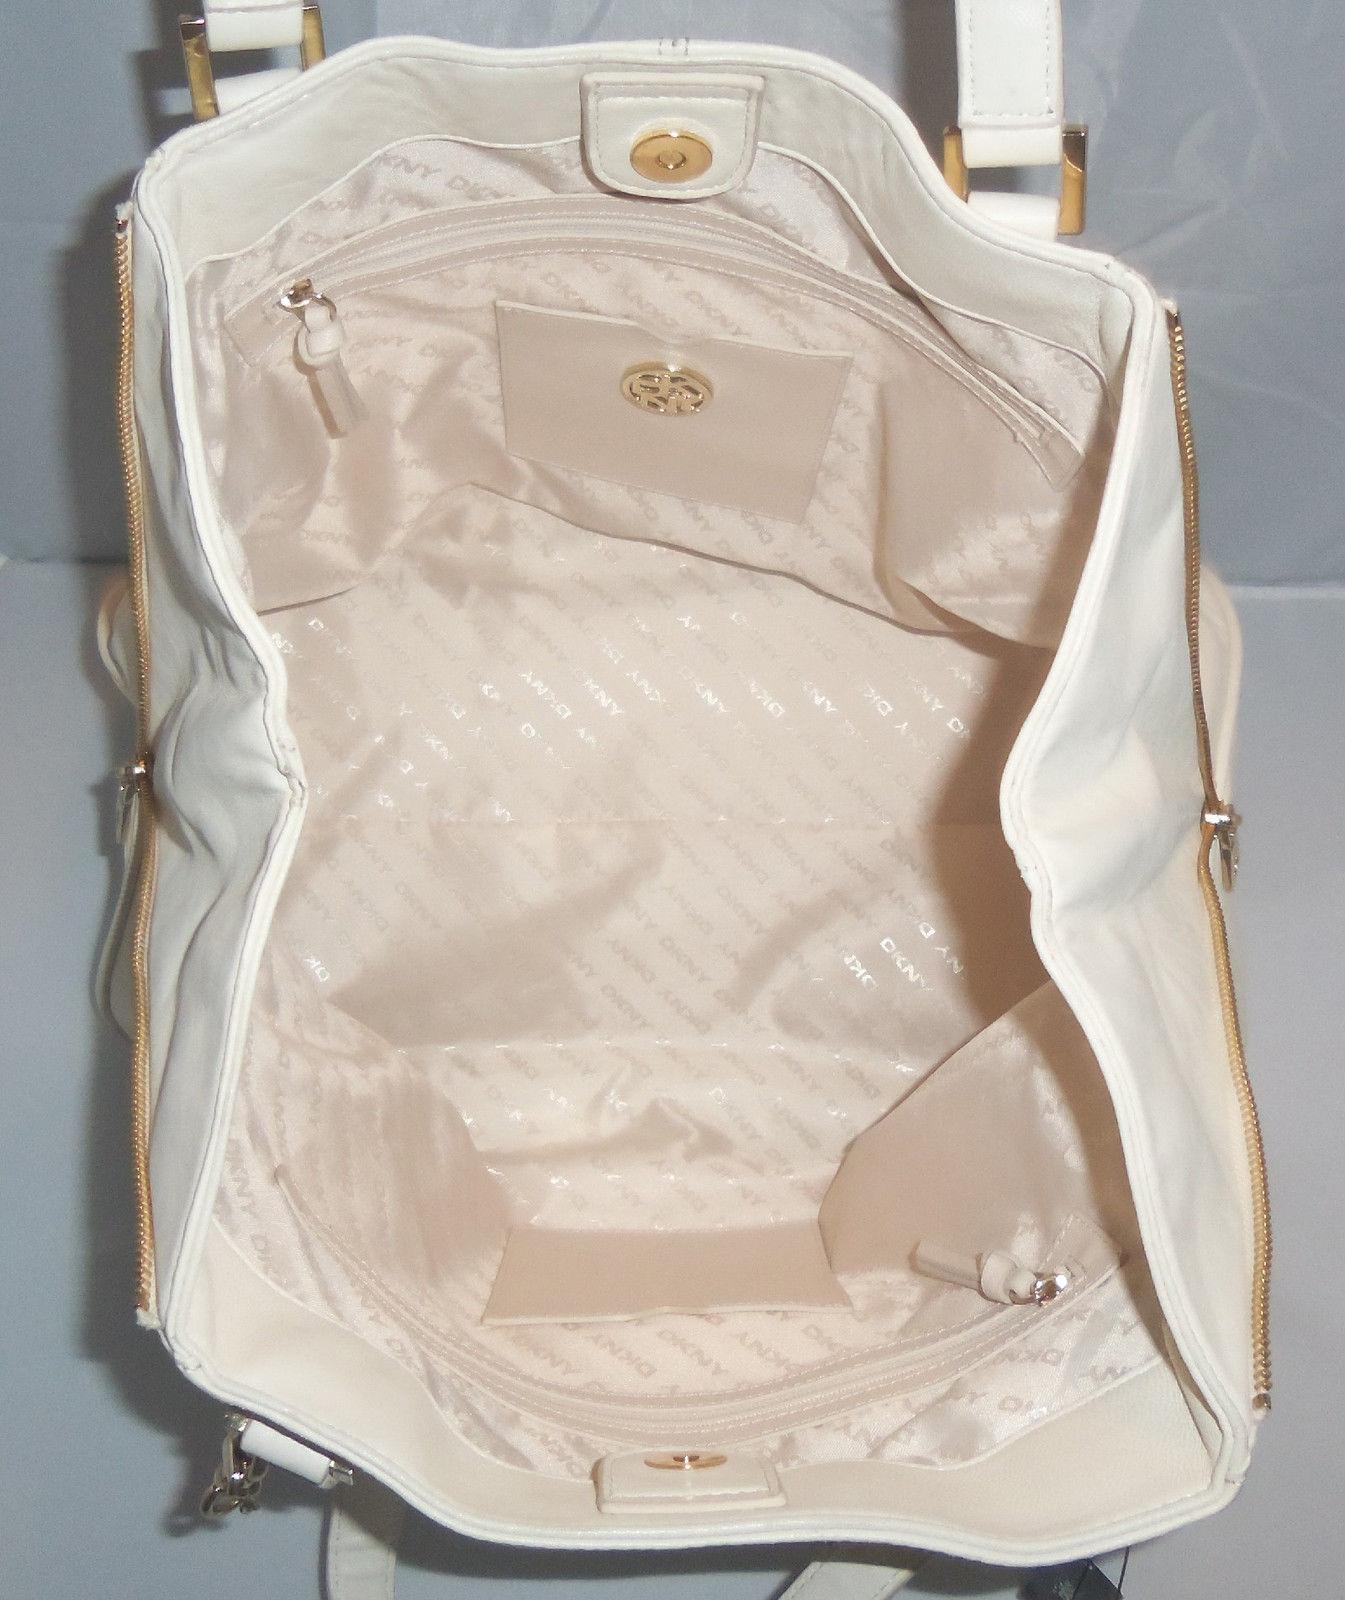 DKNY Handbag Lamb Nappa Large Zip Tote, Shoulder Bag, Shopper, Purse $385 Ivory